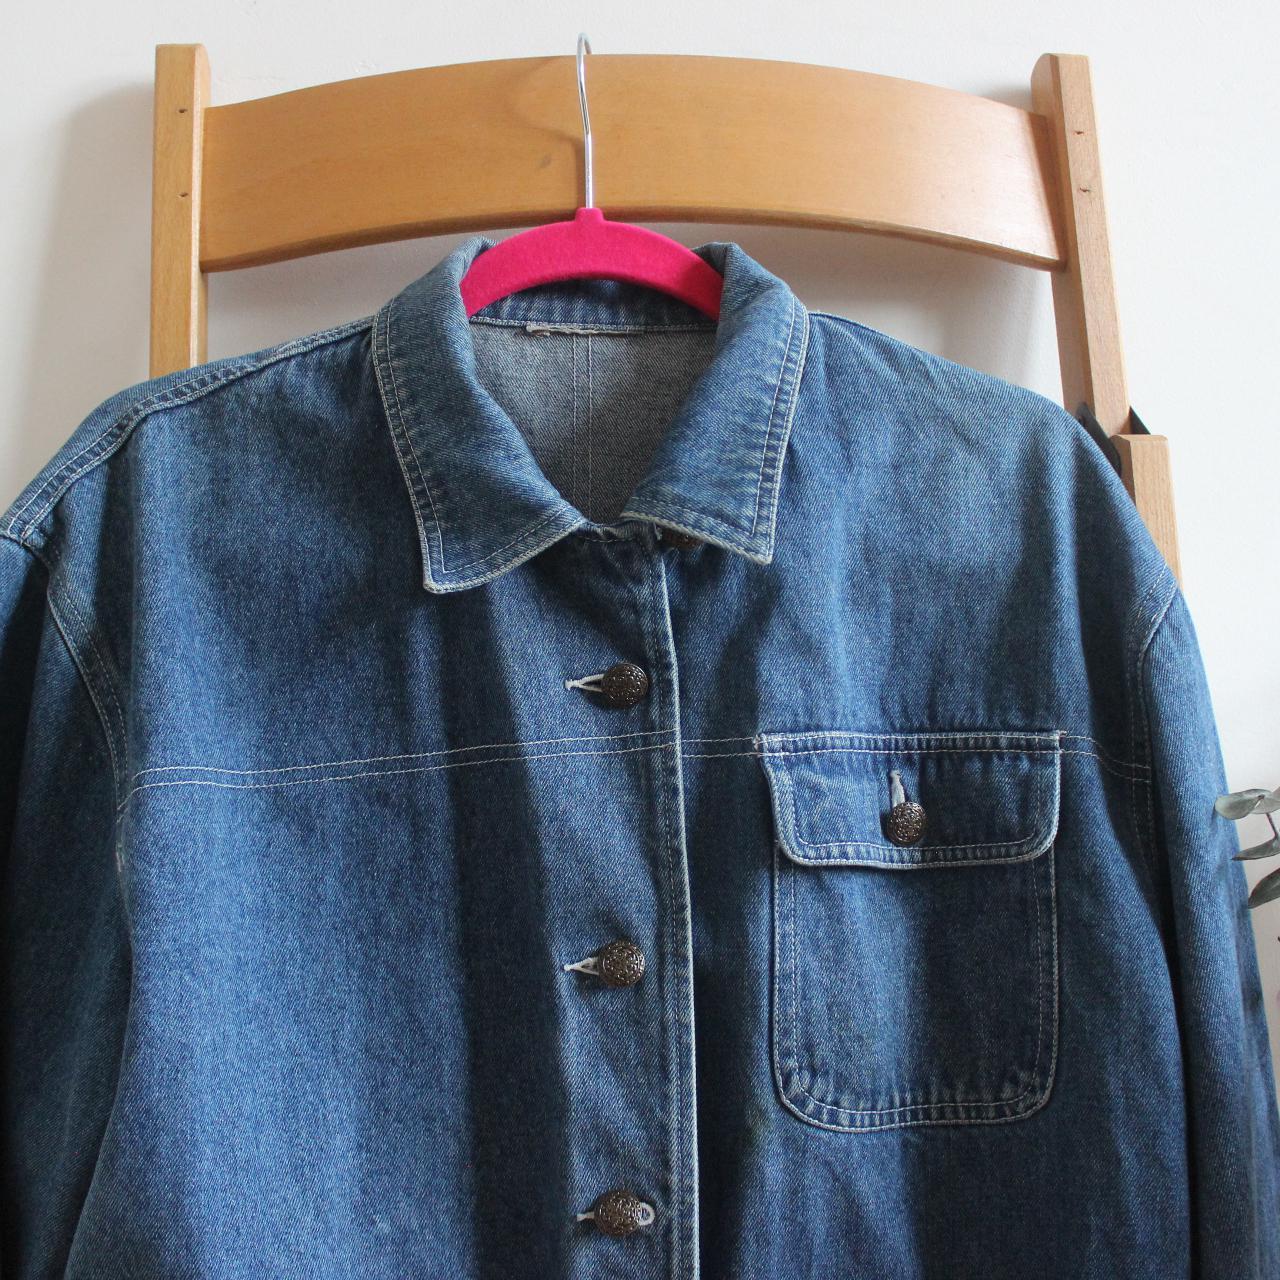 Product Image 1 - long denim jacket/shirt  smart and cute